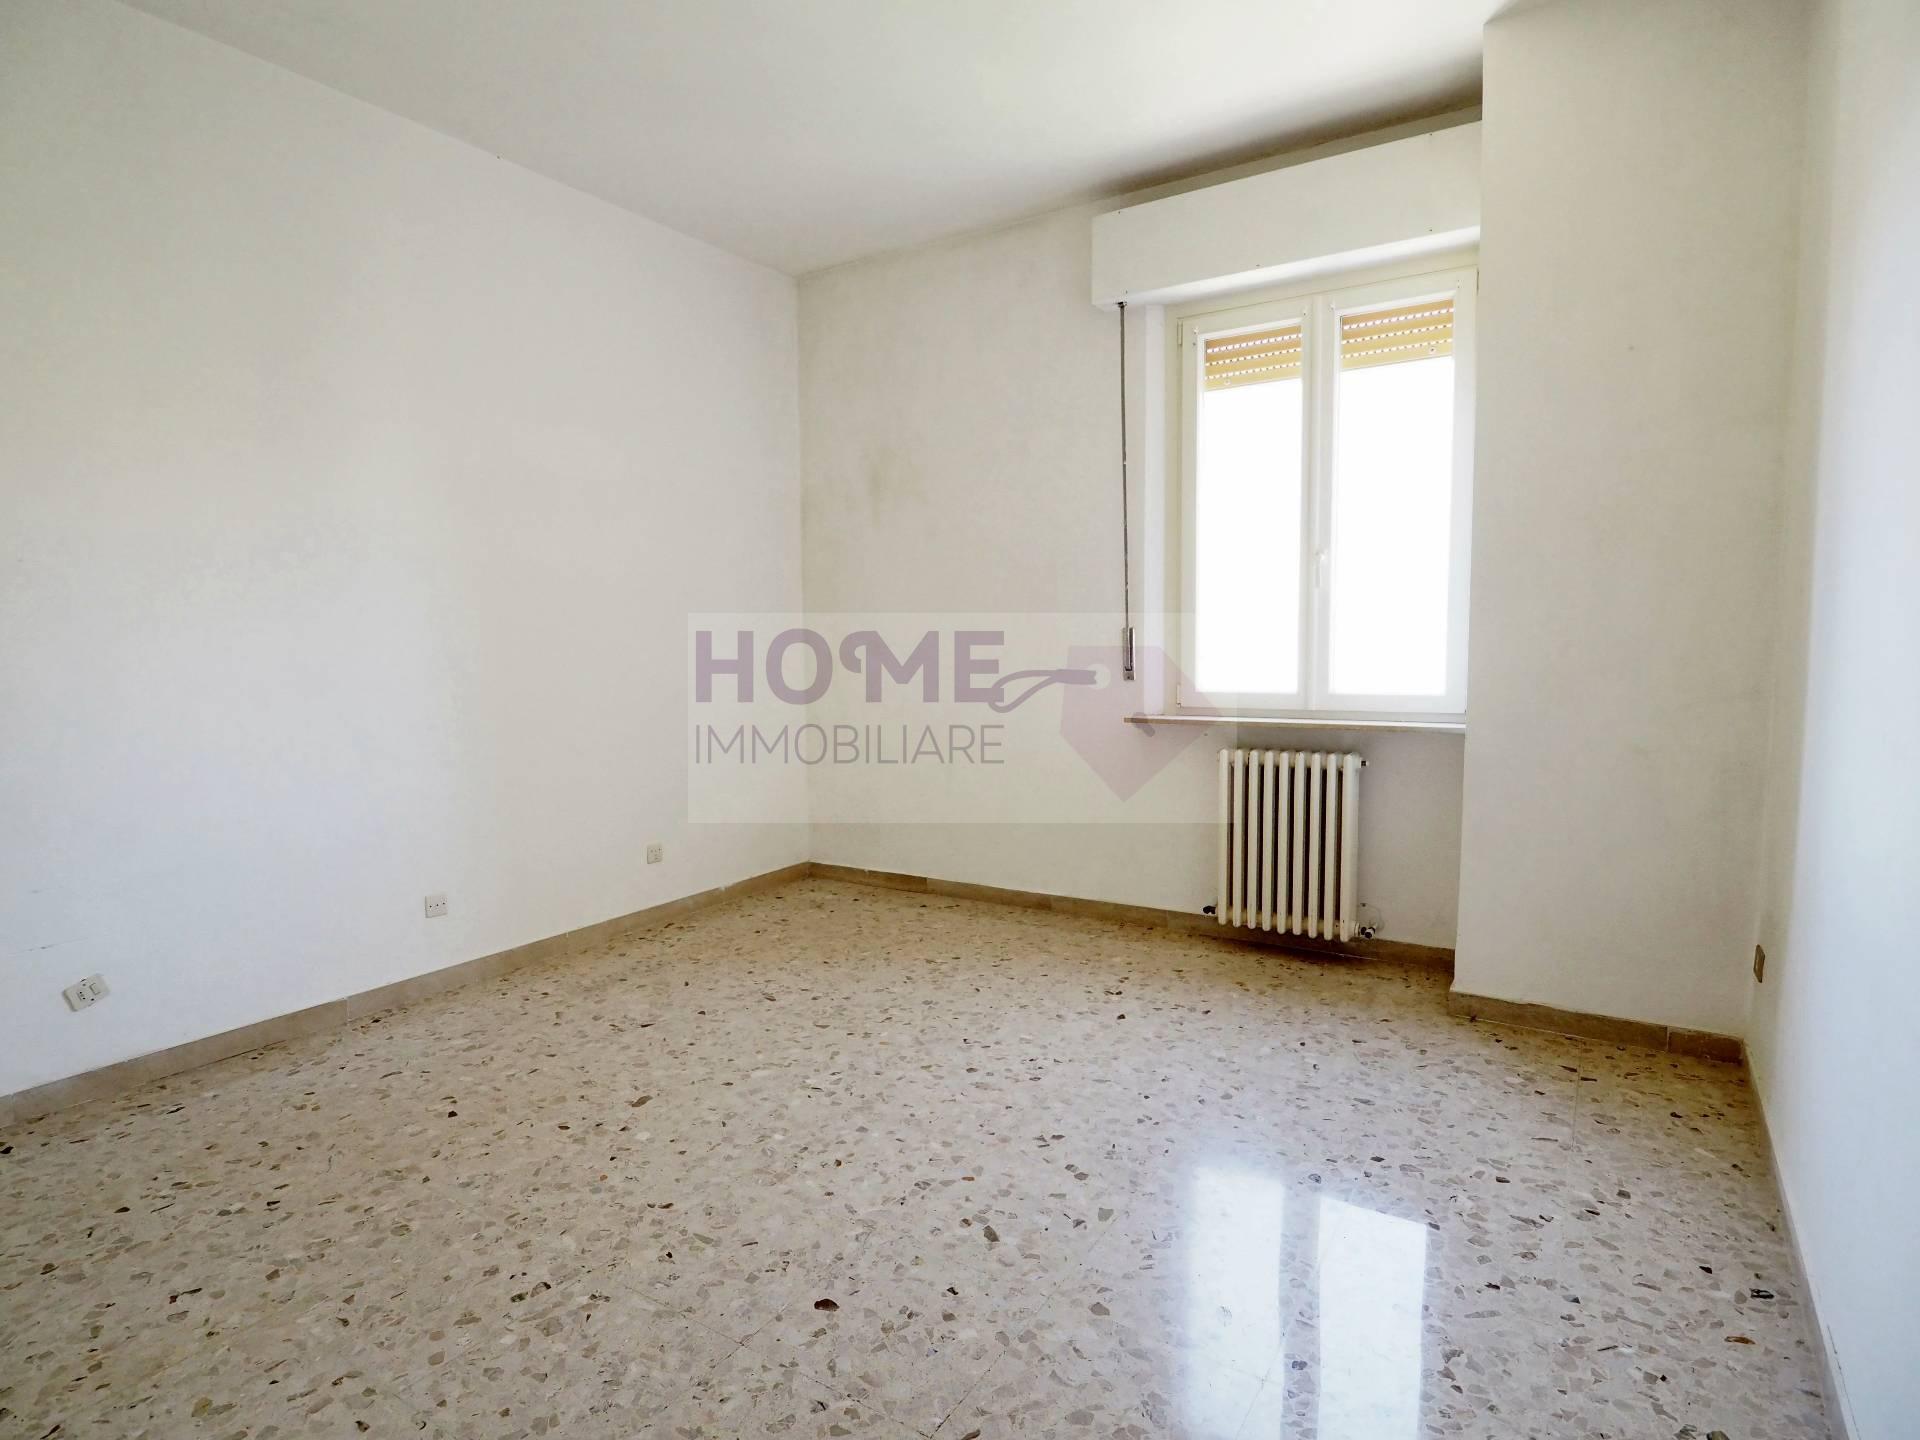 macerata vendita quart: zona via spalato home-immobiliare-snc